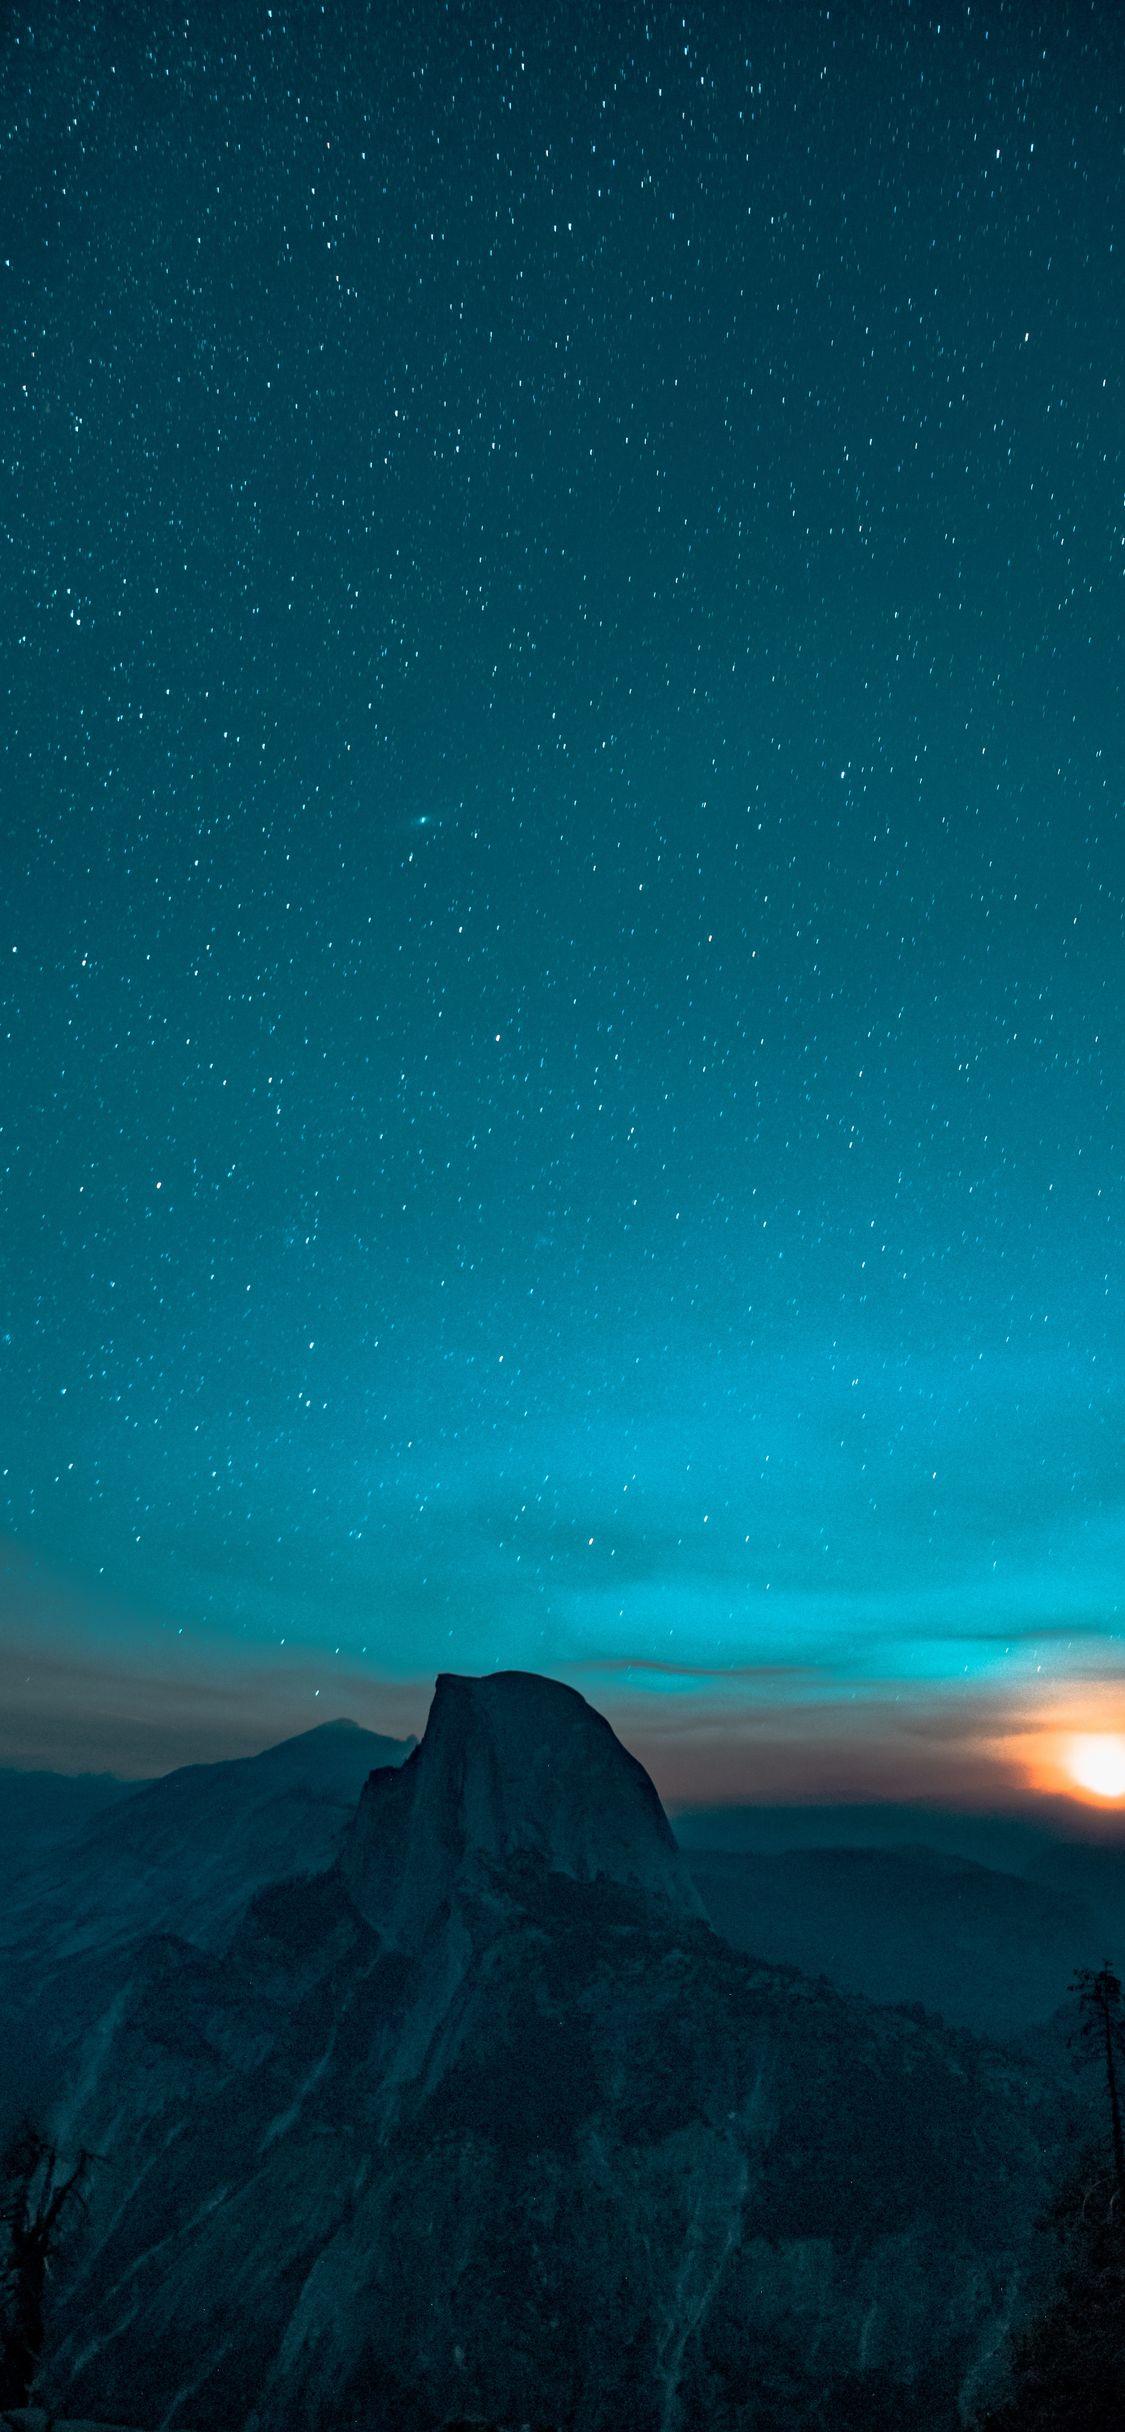 Yosemite-Etats-Unis-nuit-etoilee